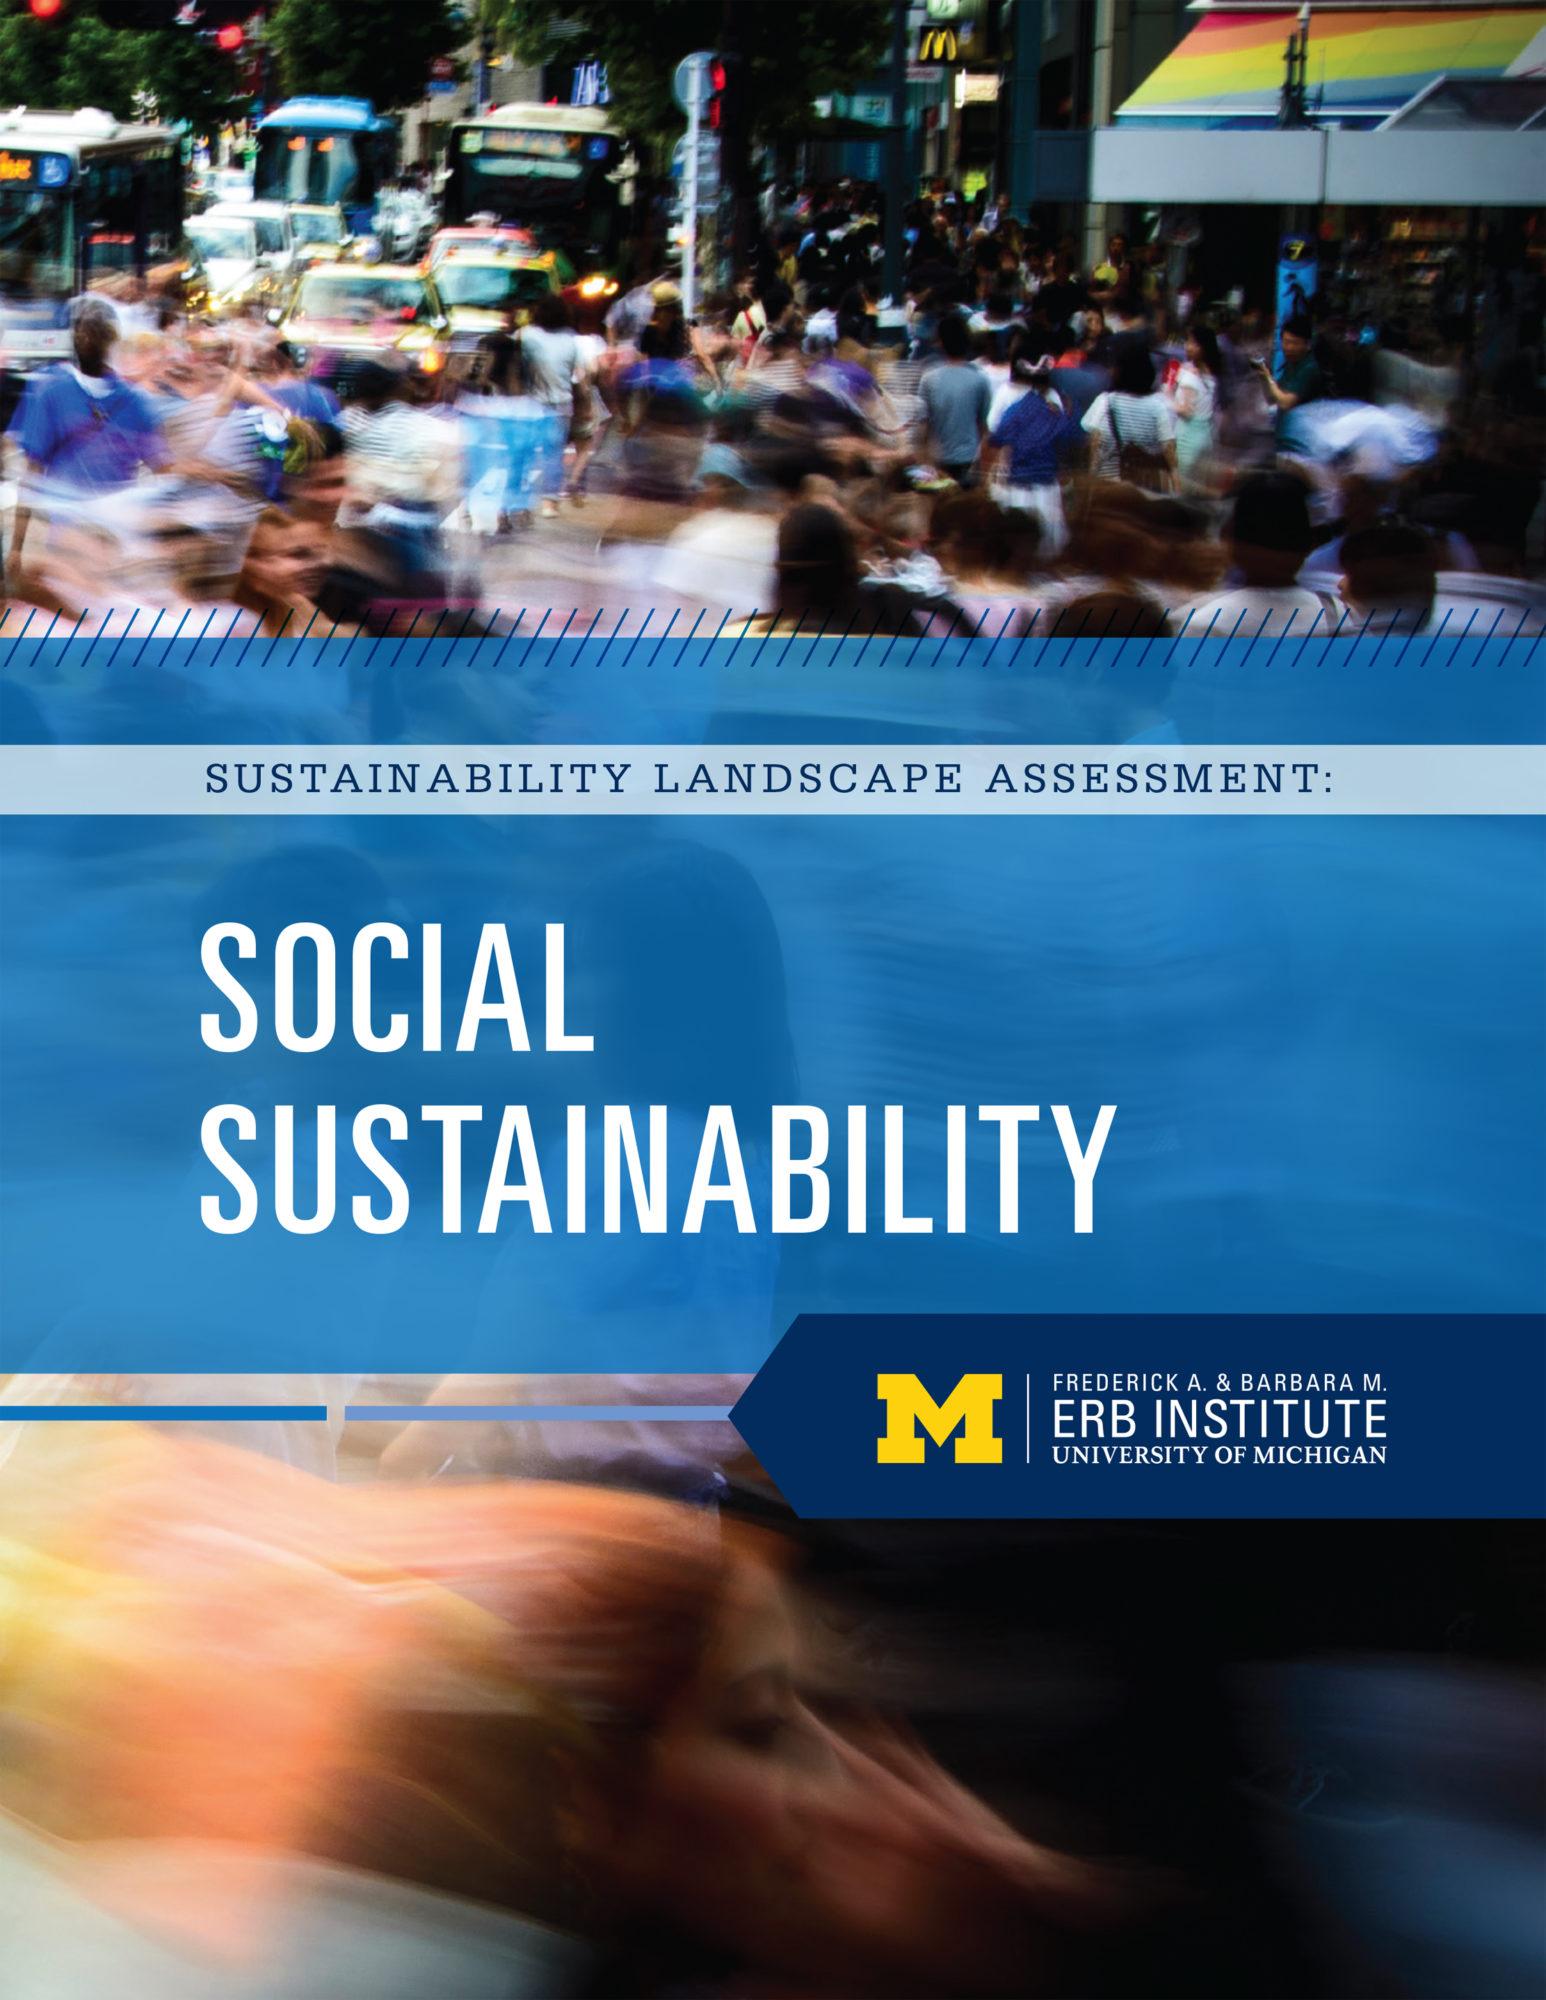 Sustainability Landscape Assessment: Social Sustainability